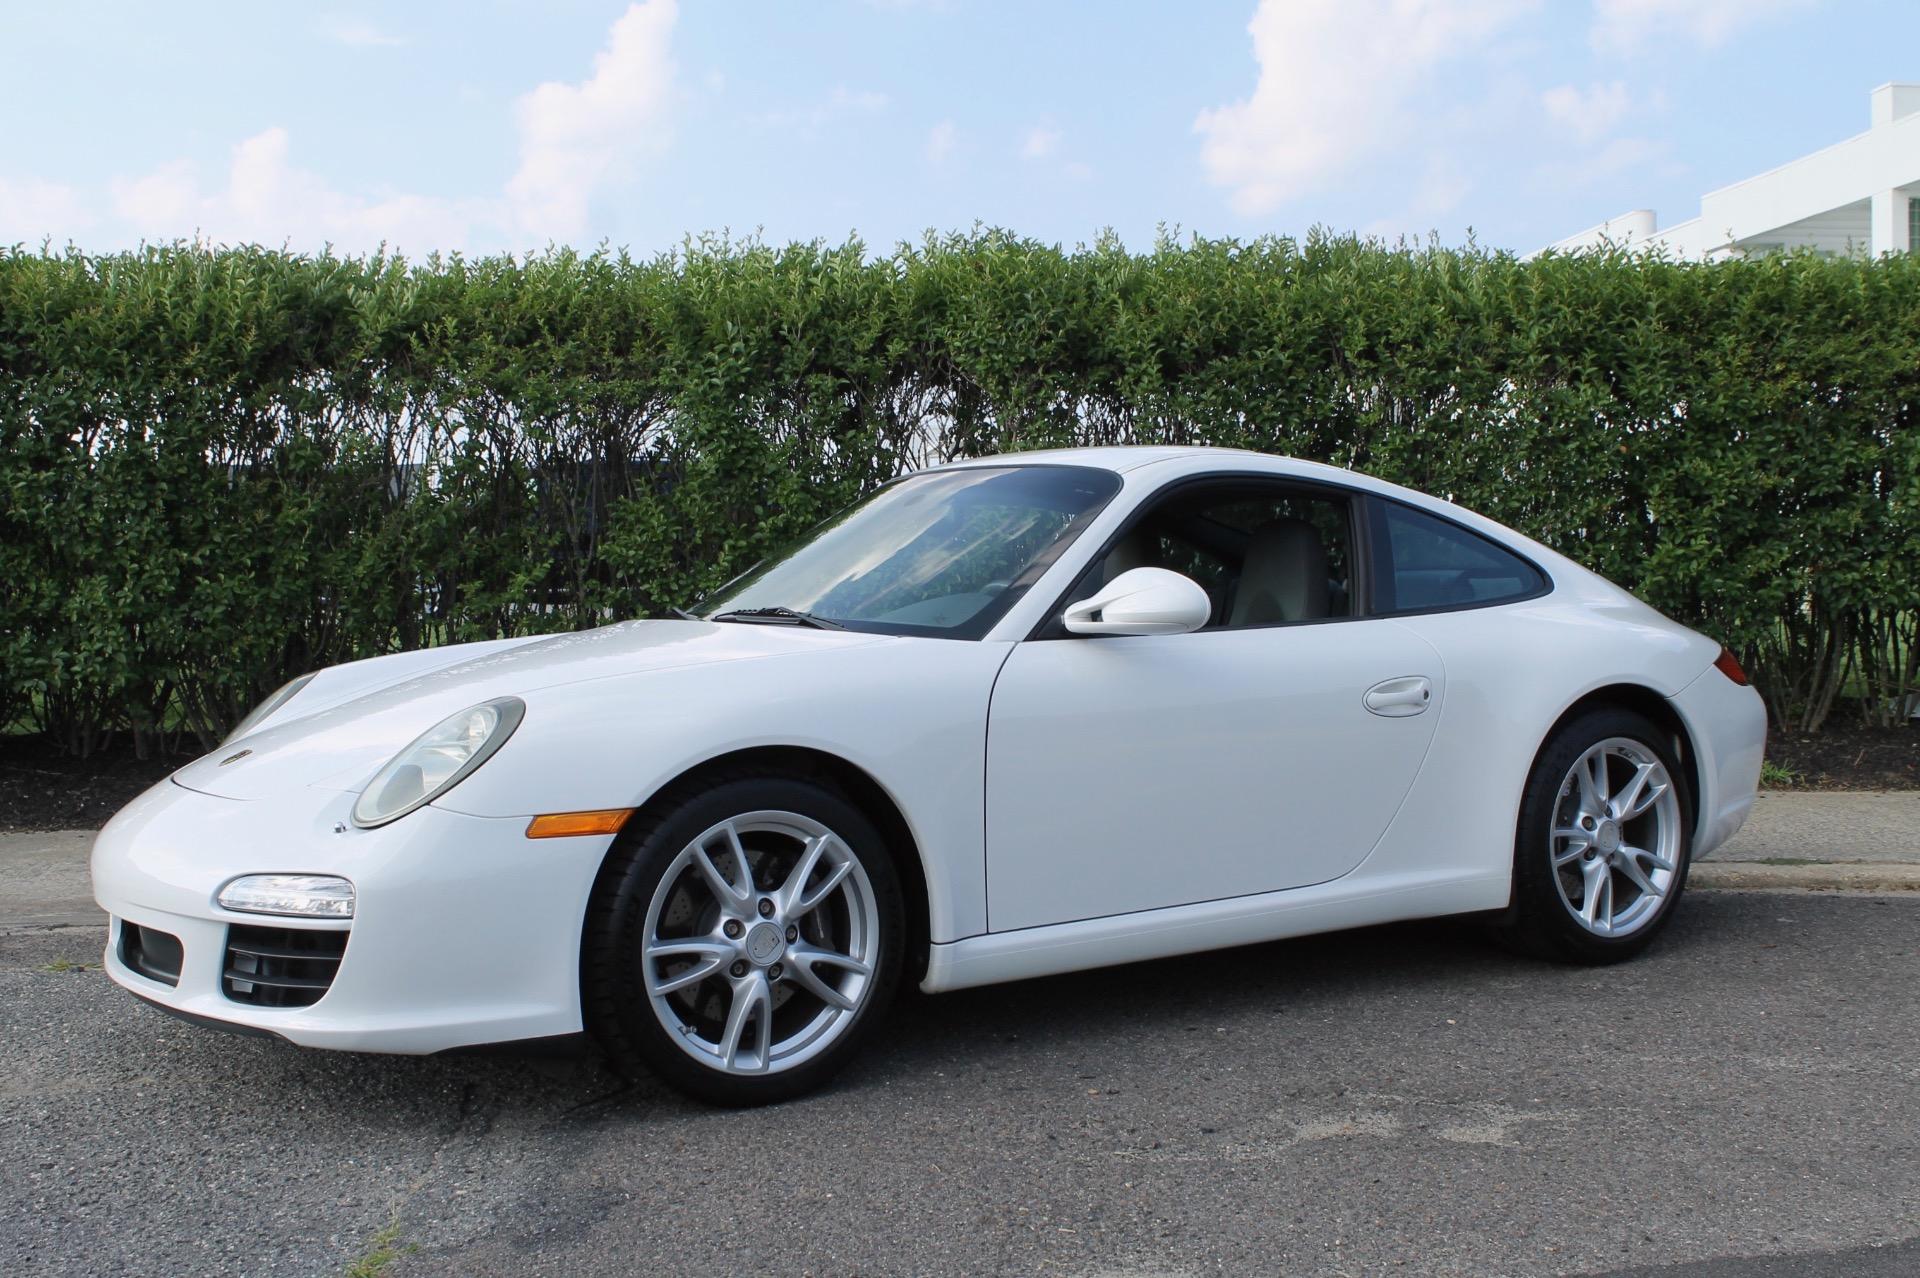 Used-2009-Porsche-911-PDK-Carrera